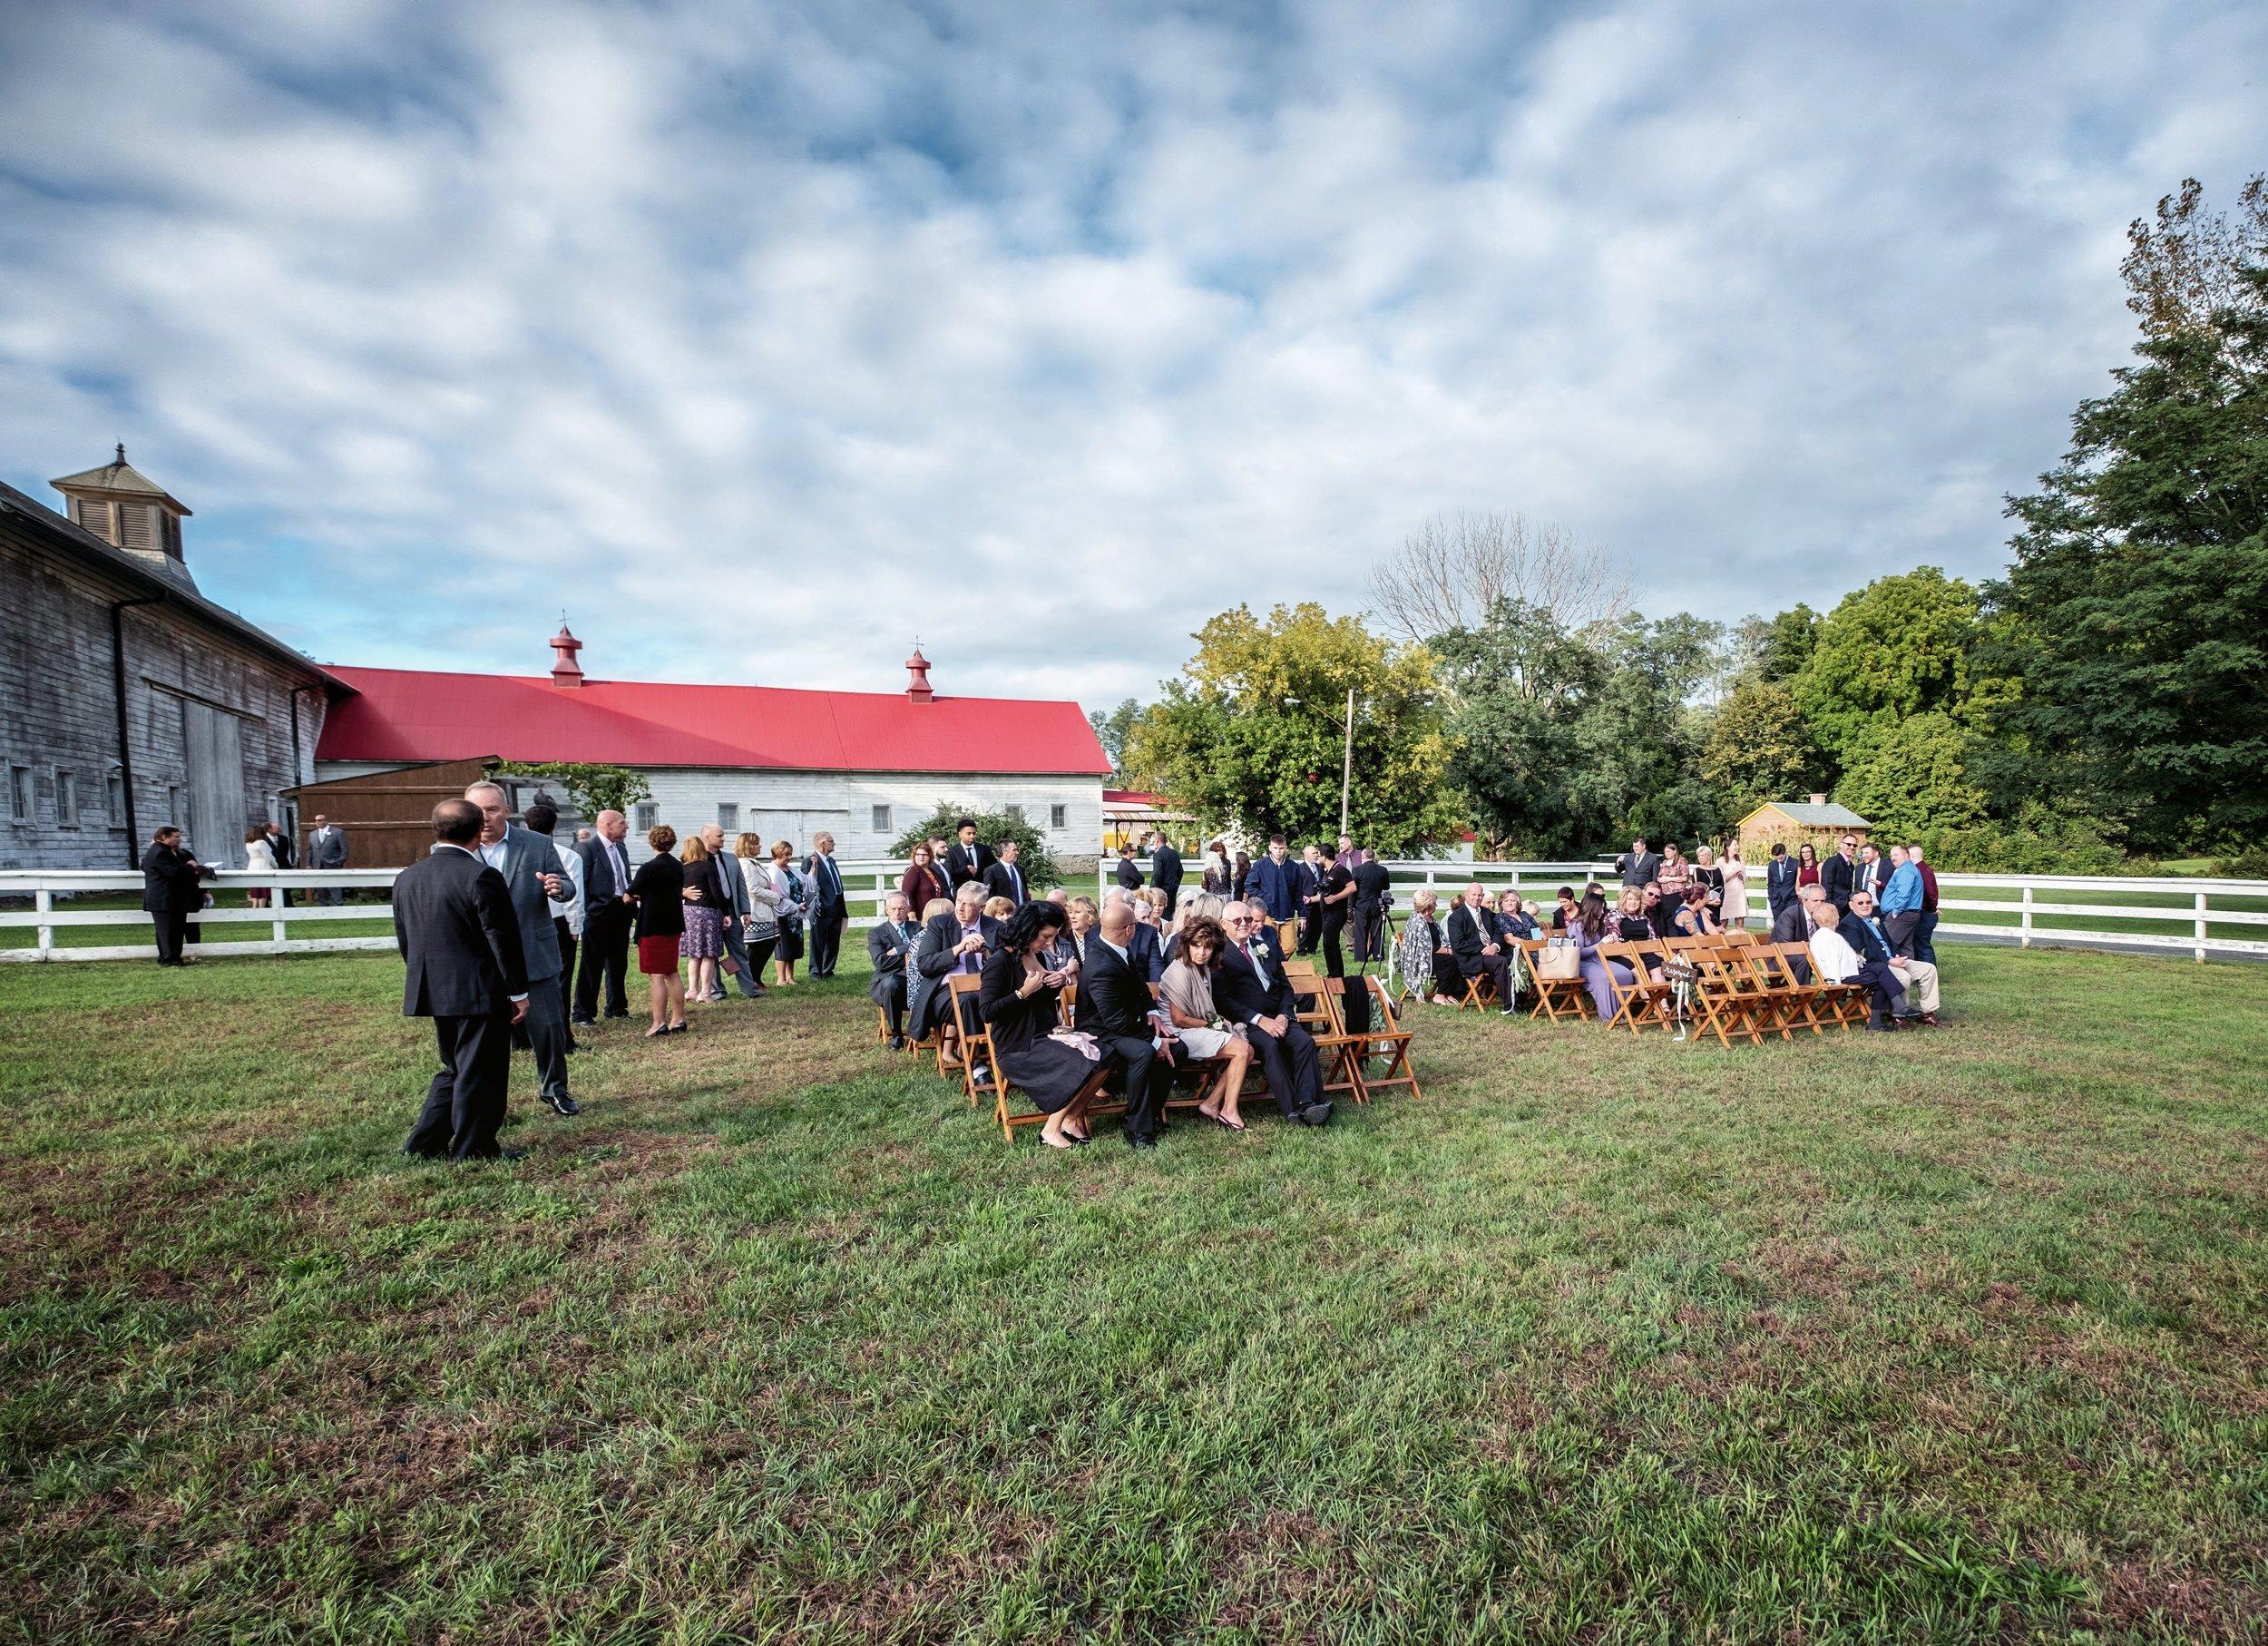 shaker-heritage-barn-wedding-photos-001.jpg